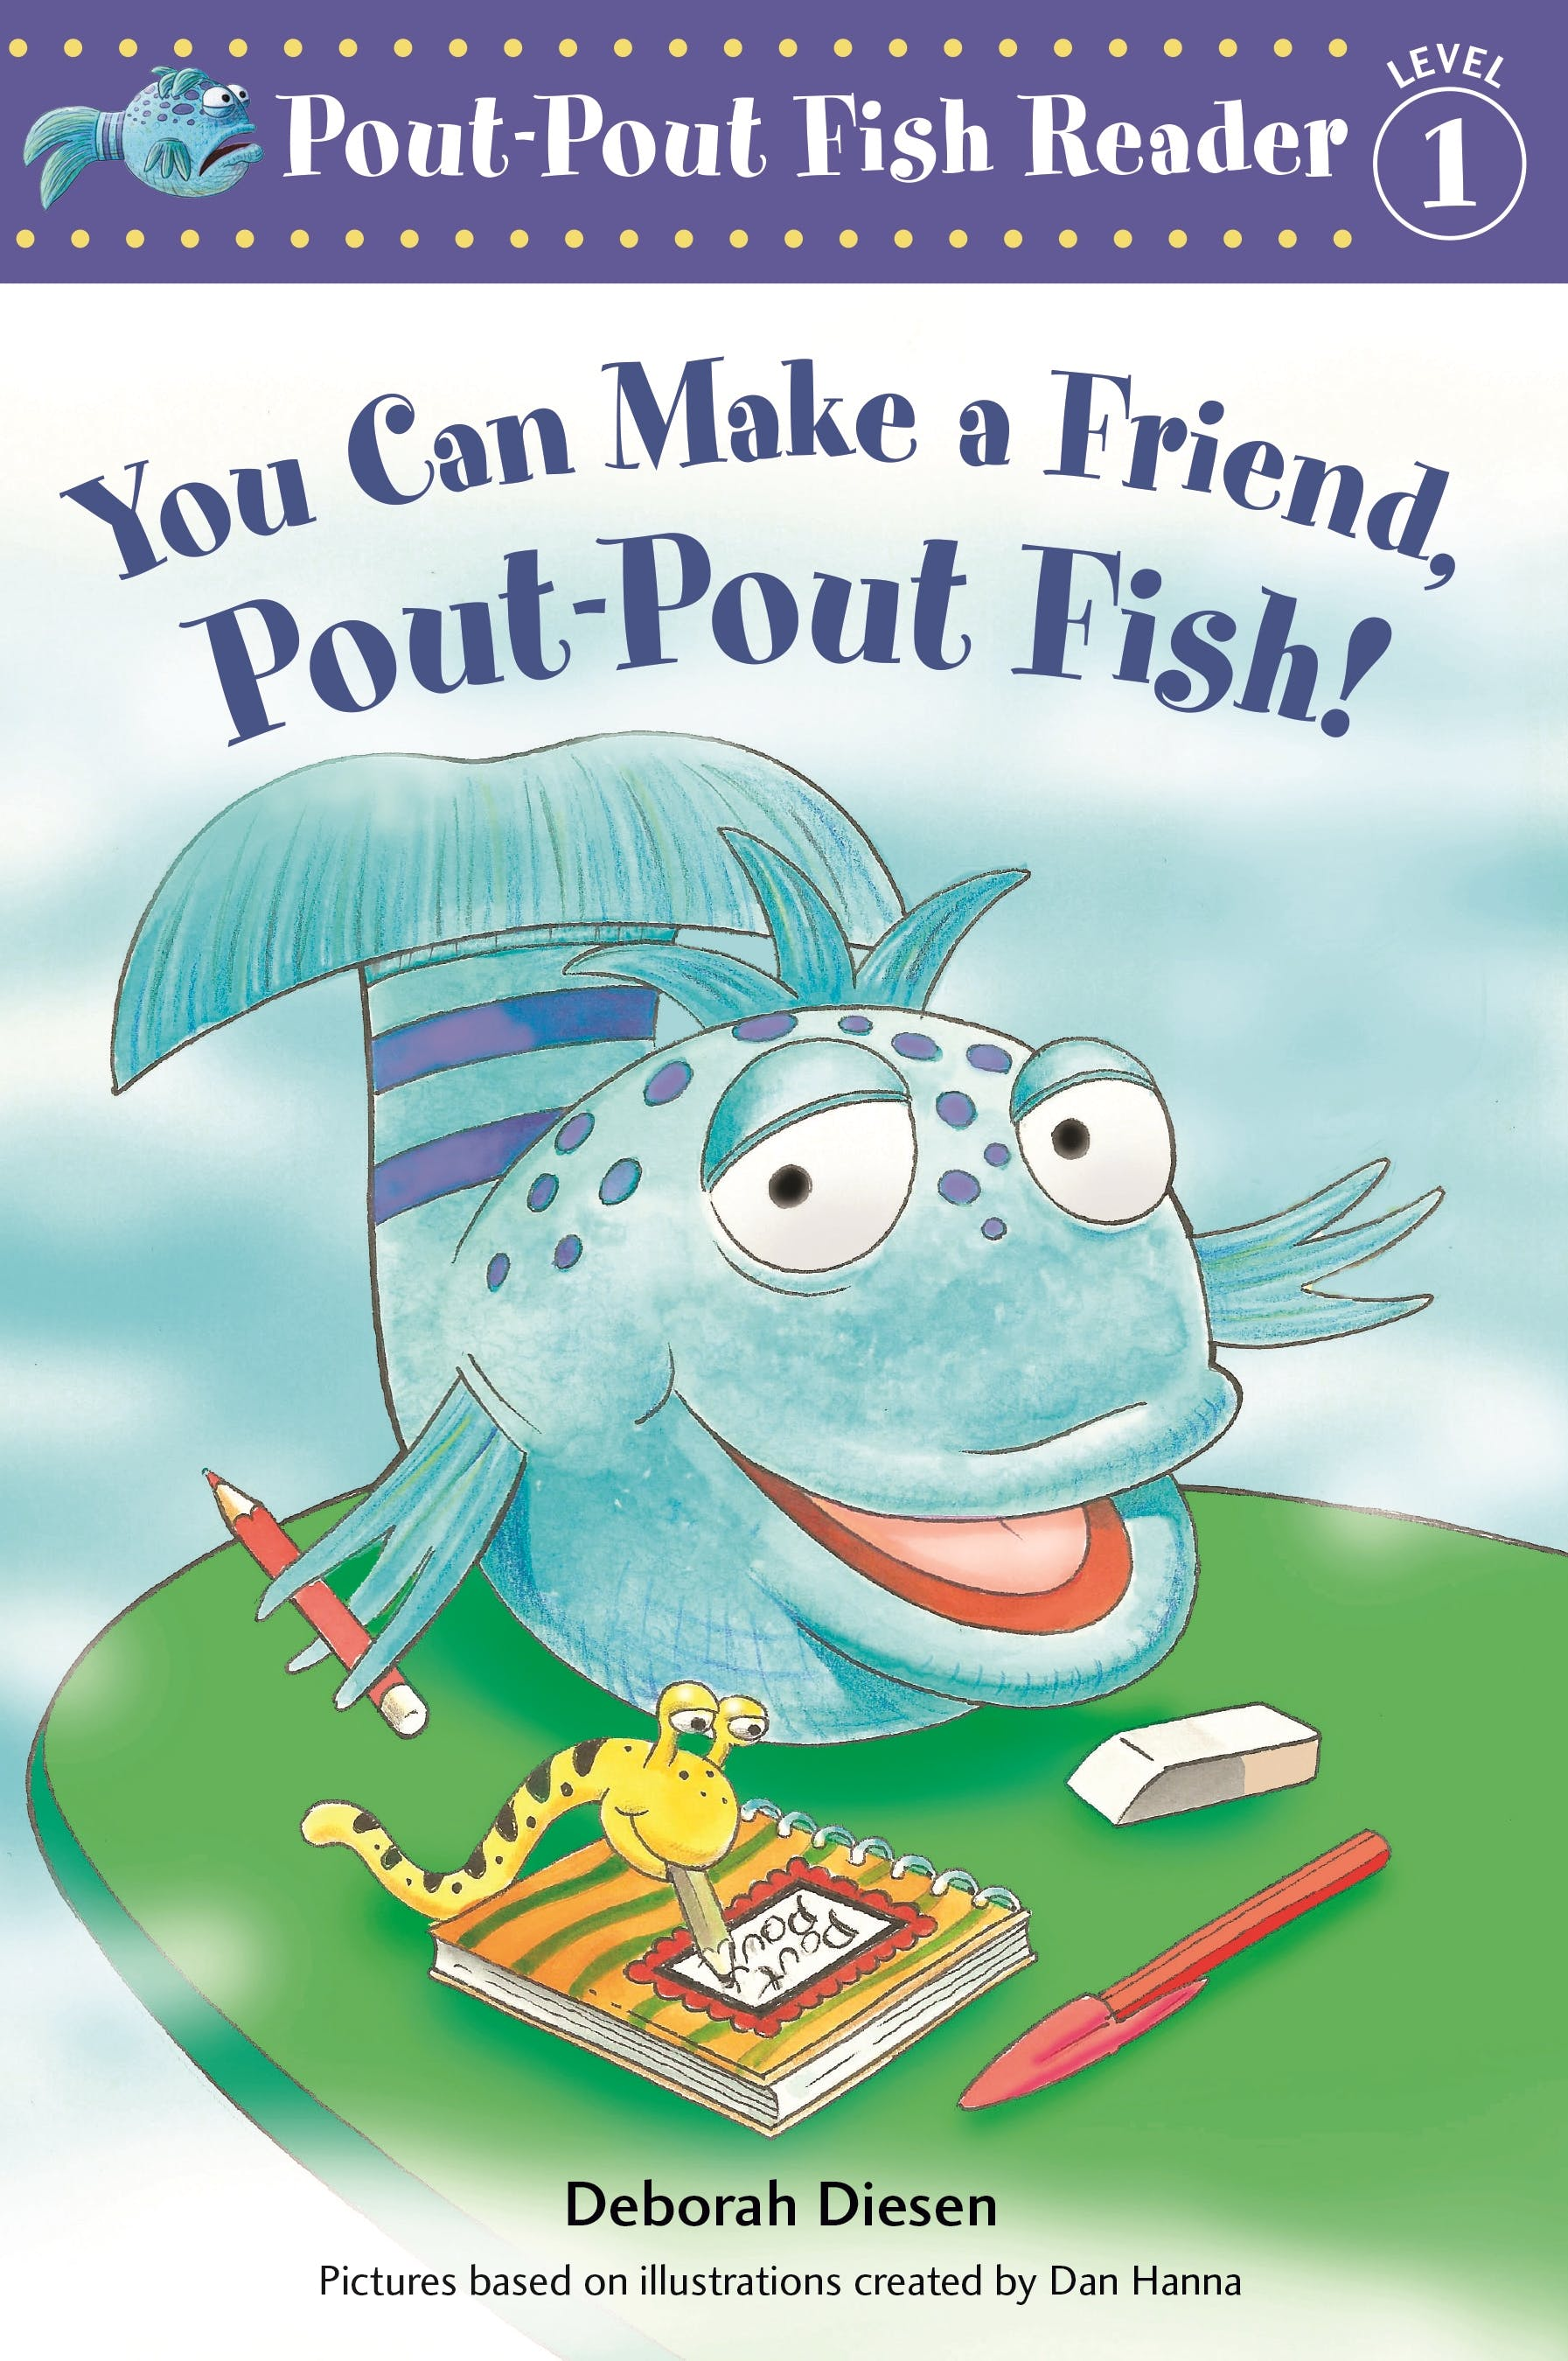 Image of You Can Make a Friend, Pout-Pout Fish!